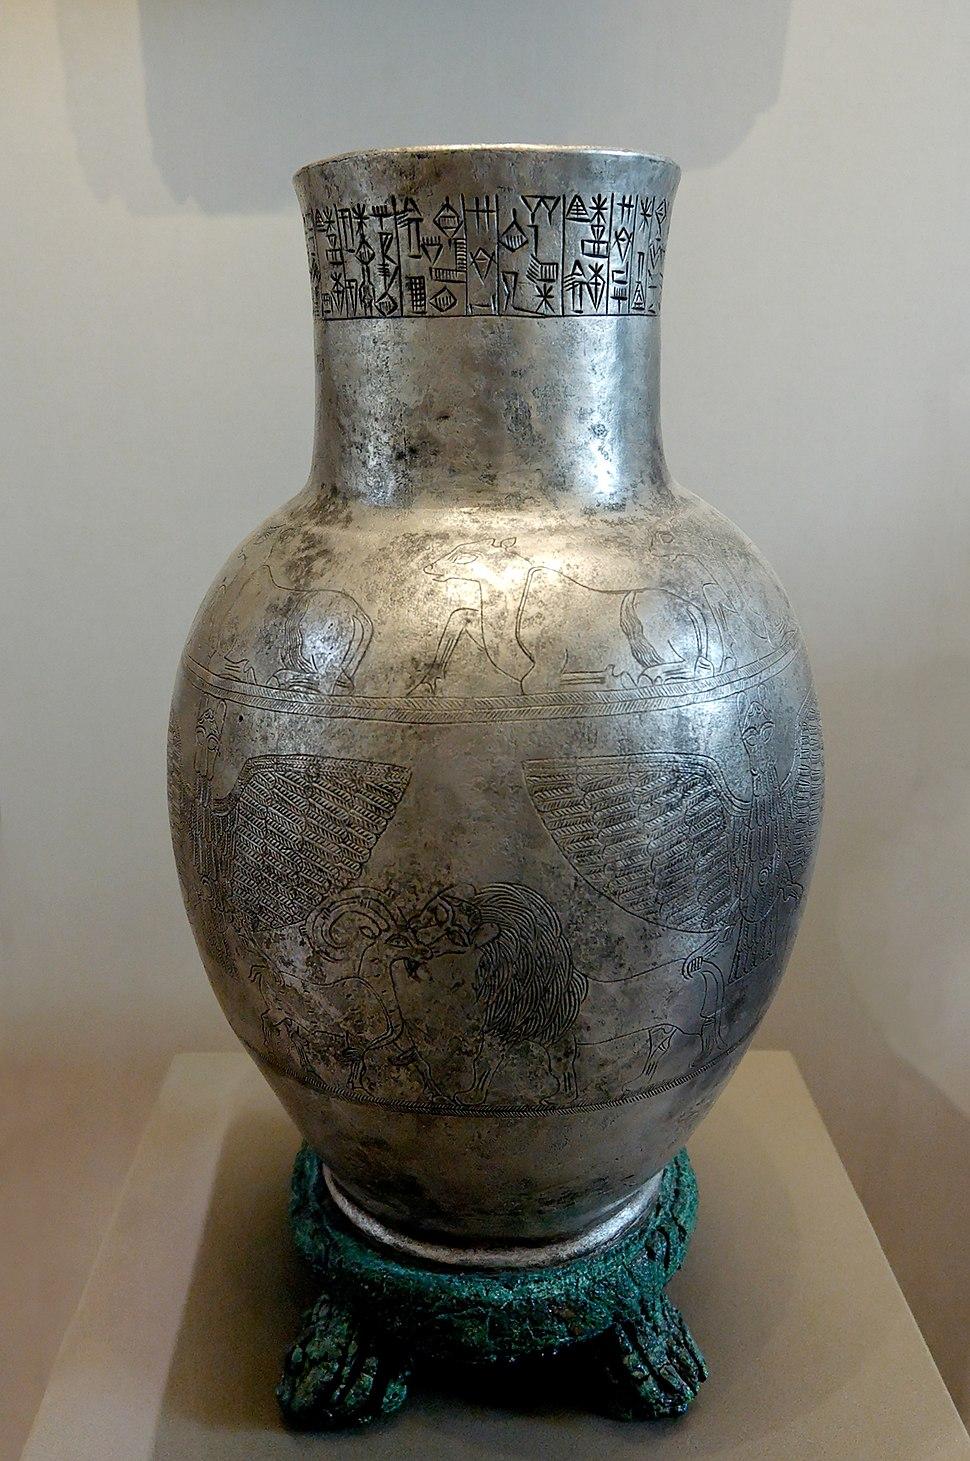 Vase Entemena Louvre AO2674